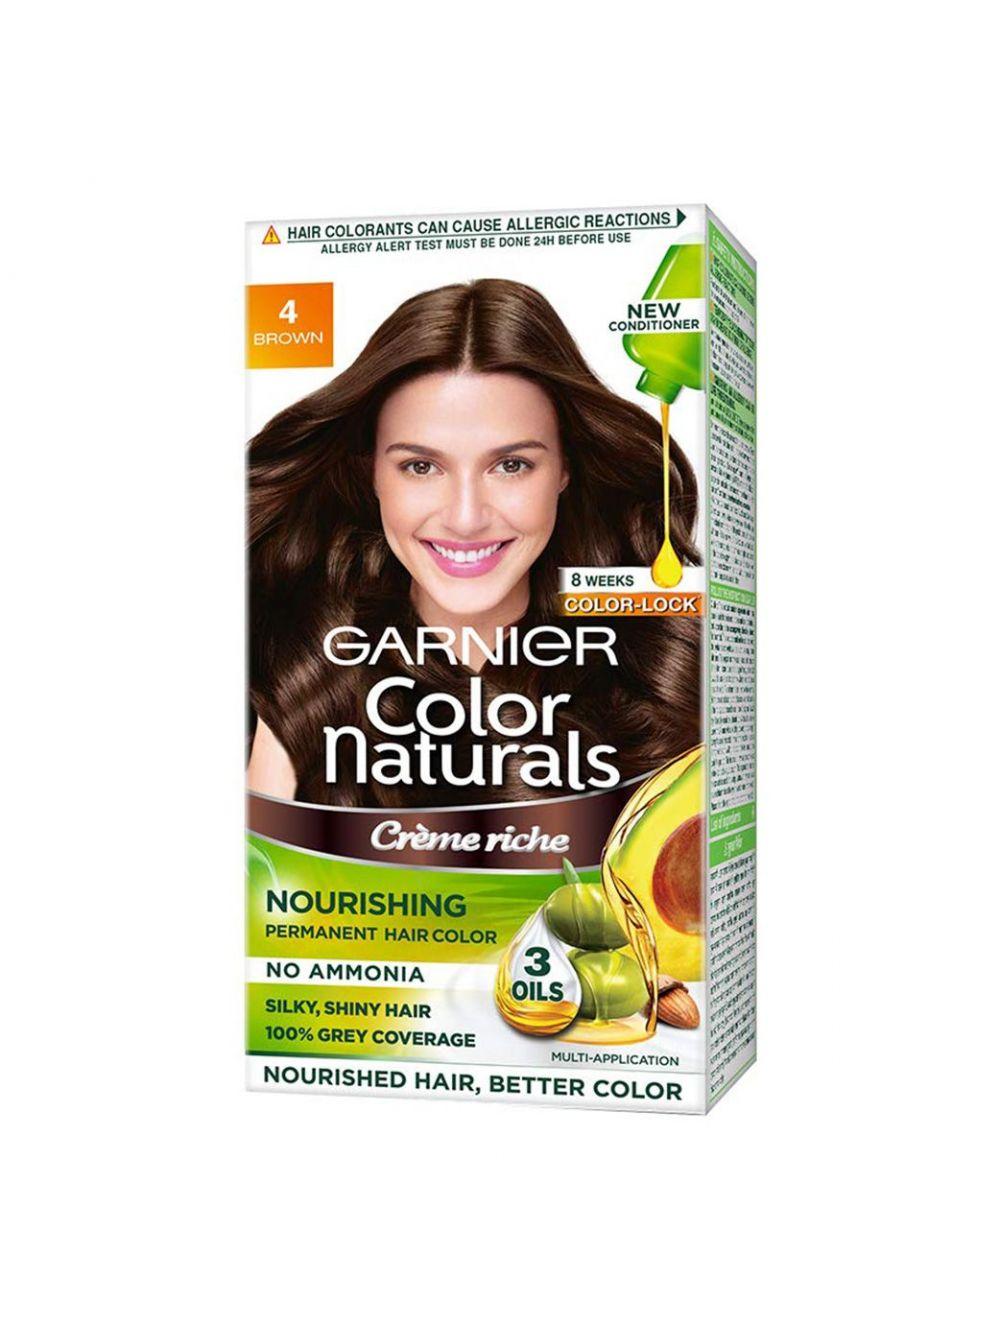 Garnier Color Naturals 4 Brown